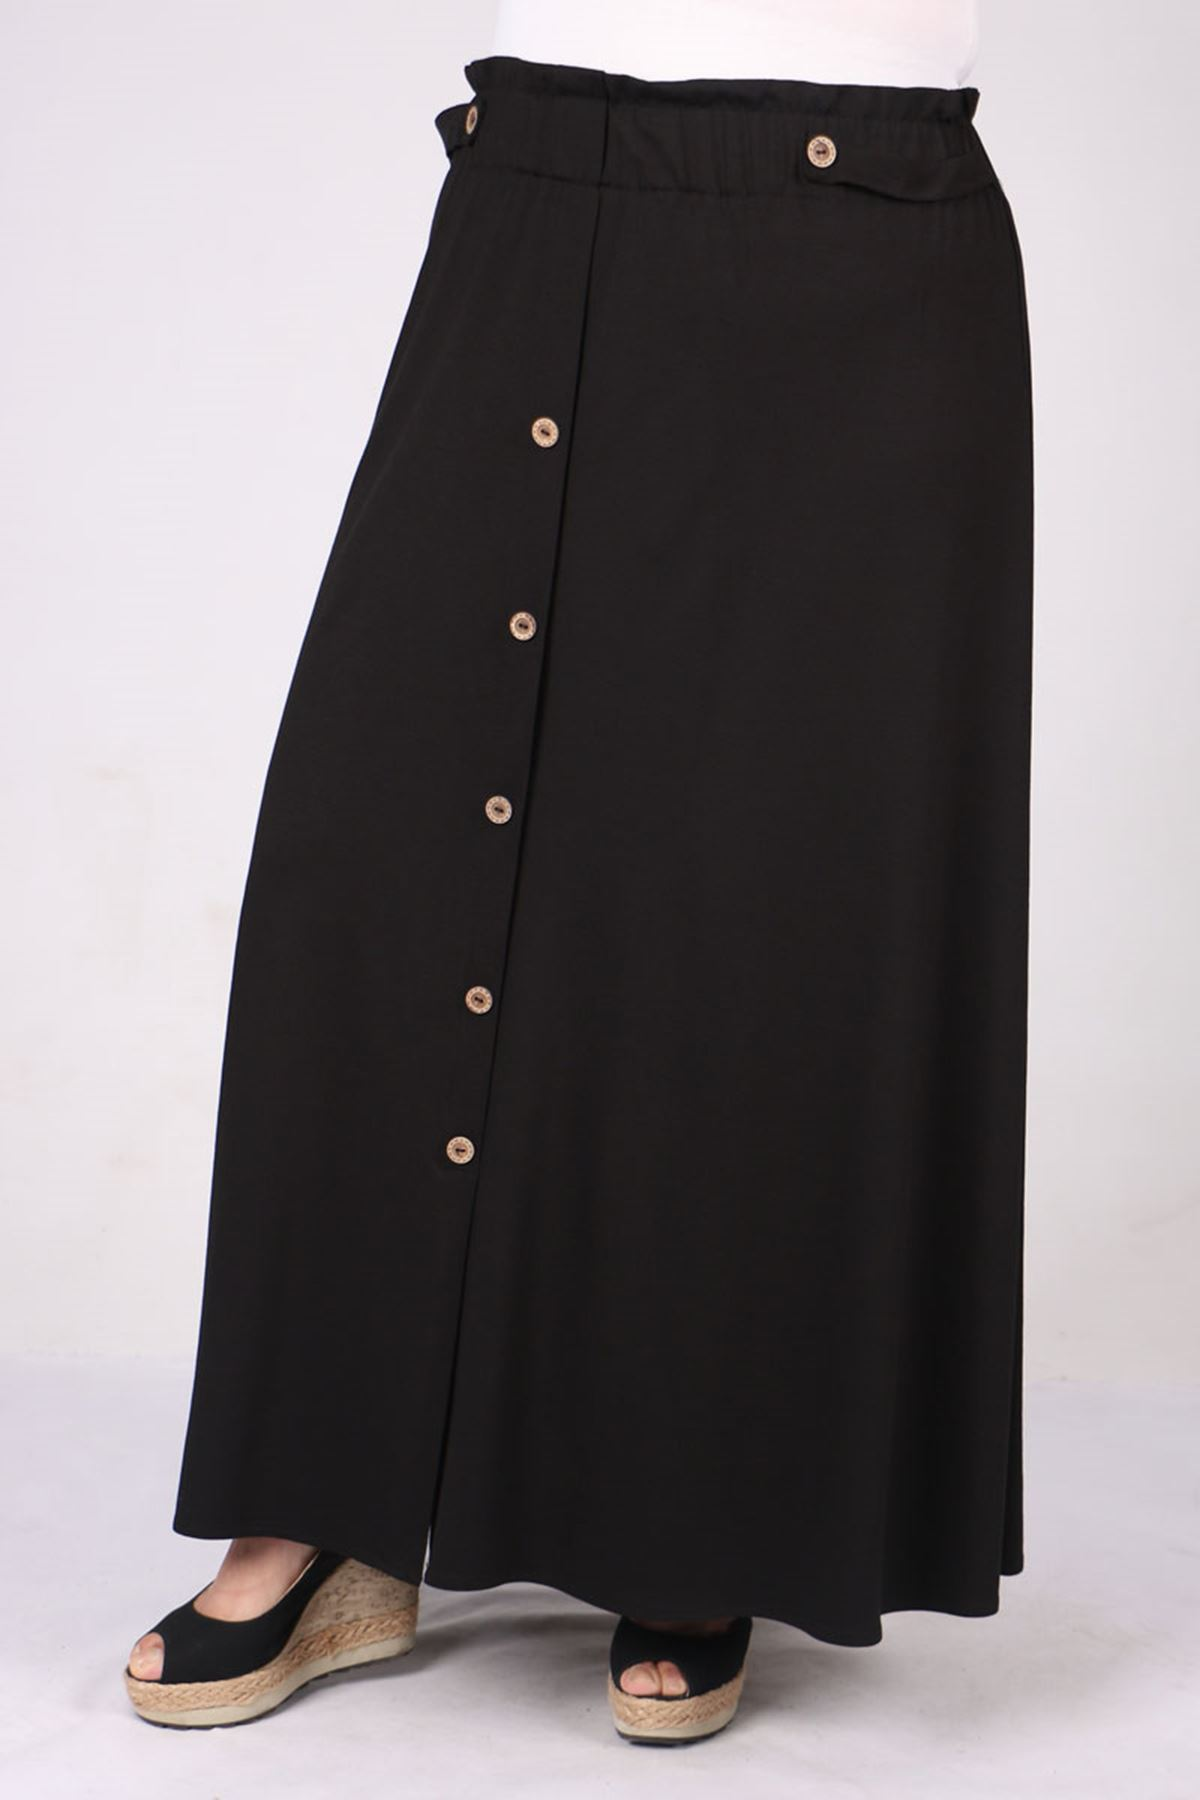 5046 Plus Size Elastic Waist Skirt with Button - Black